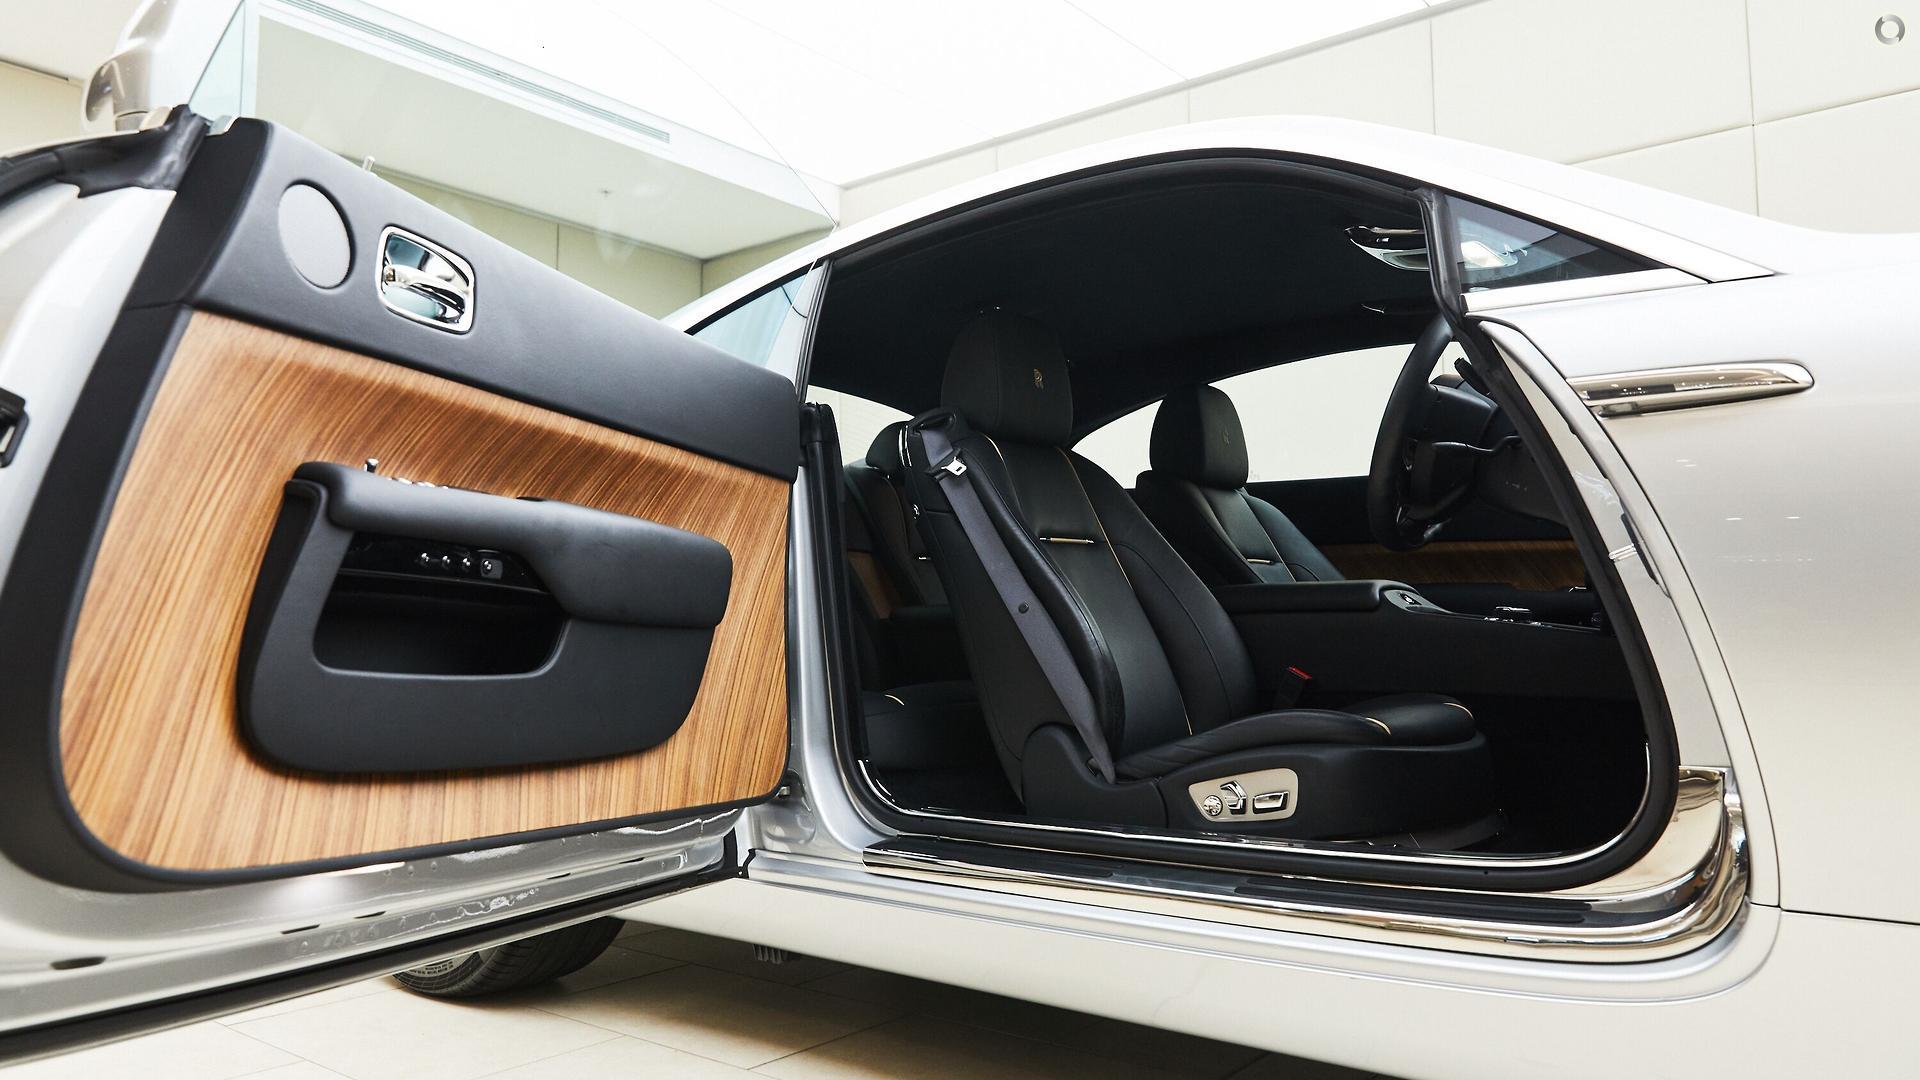 2014 Rolls-Royce Wraith (No Series)